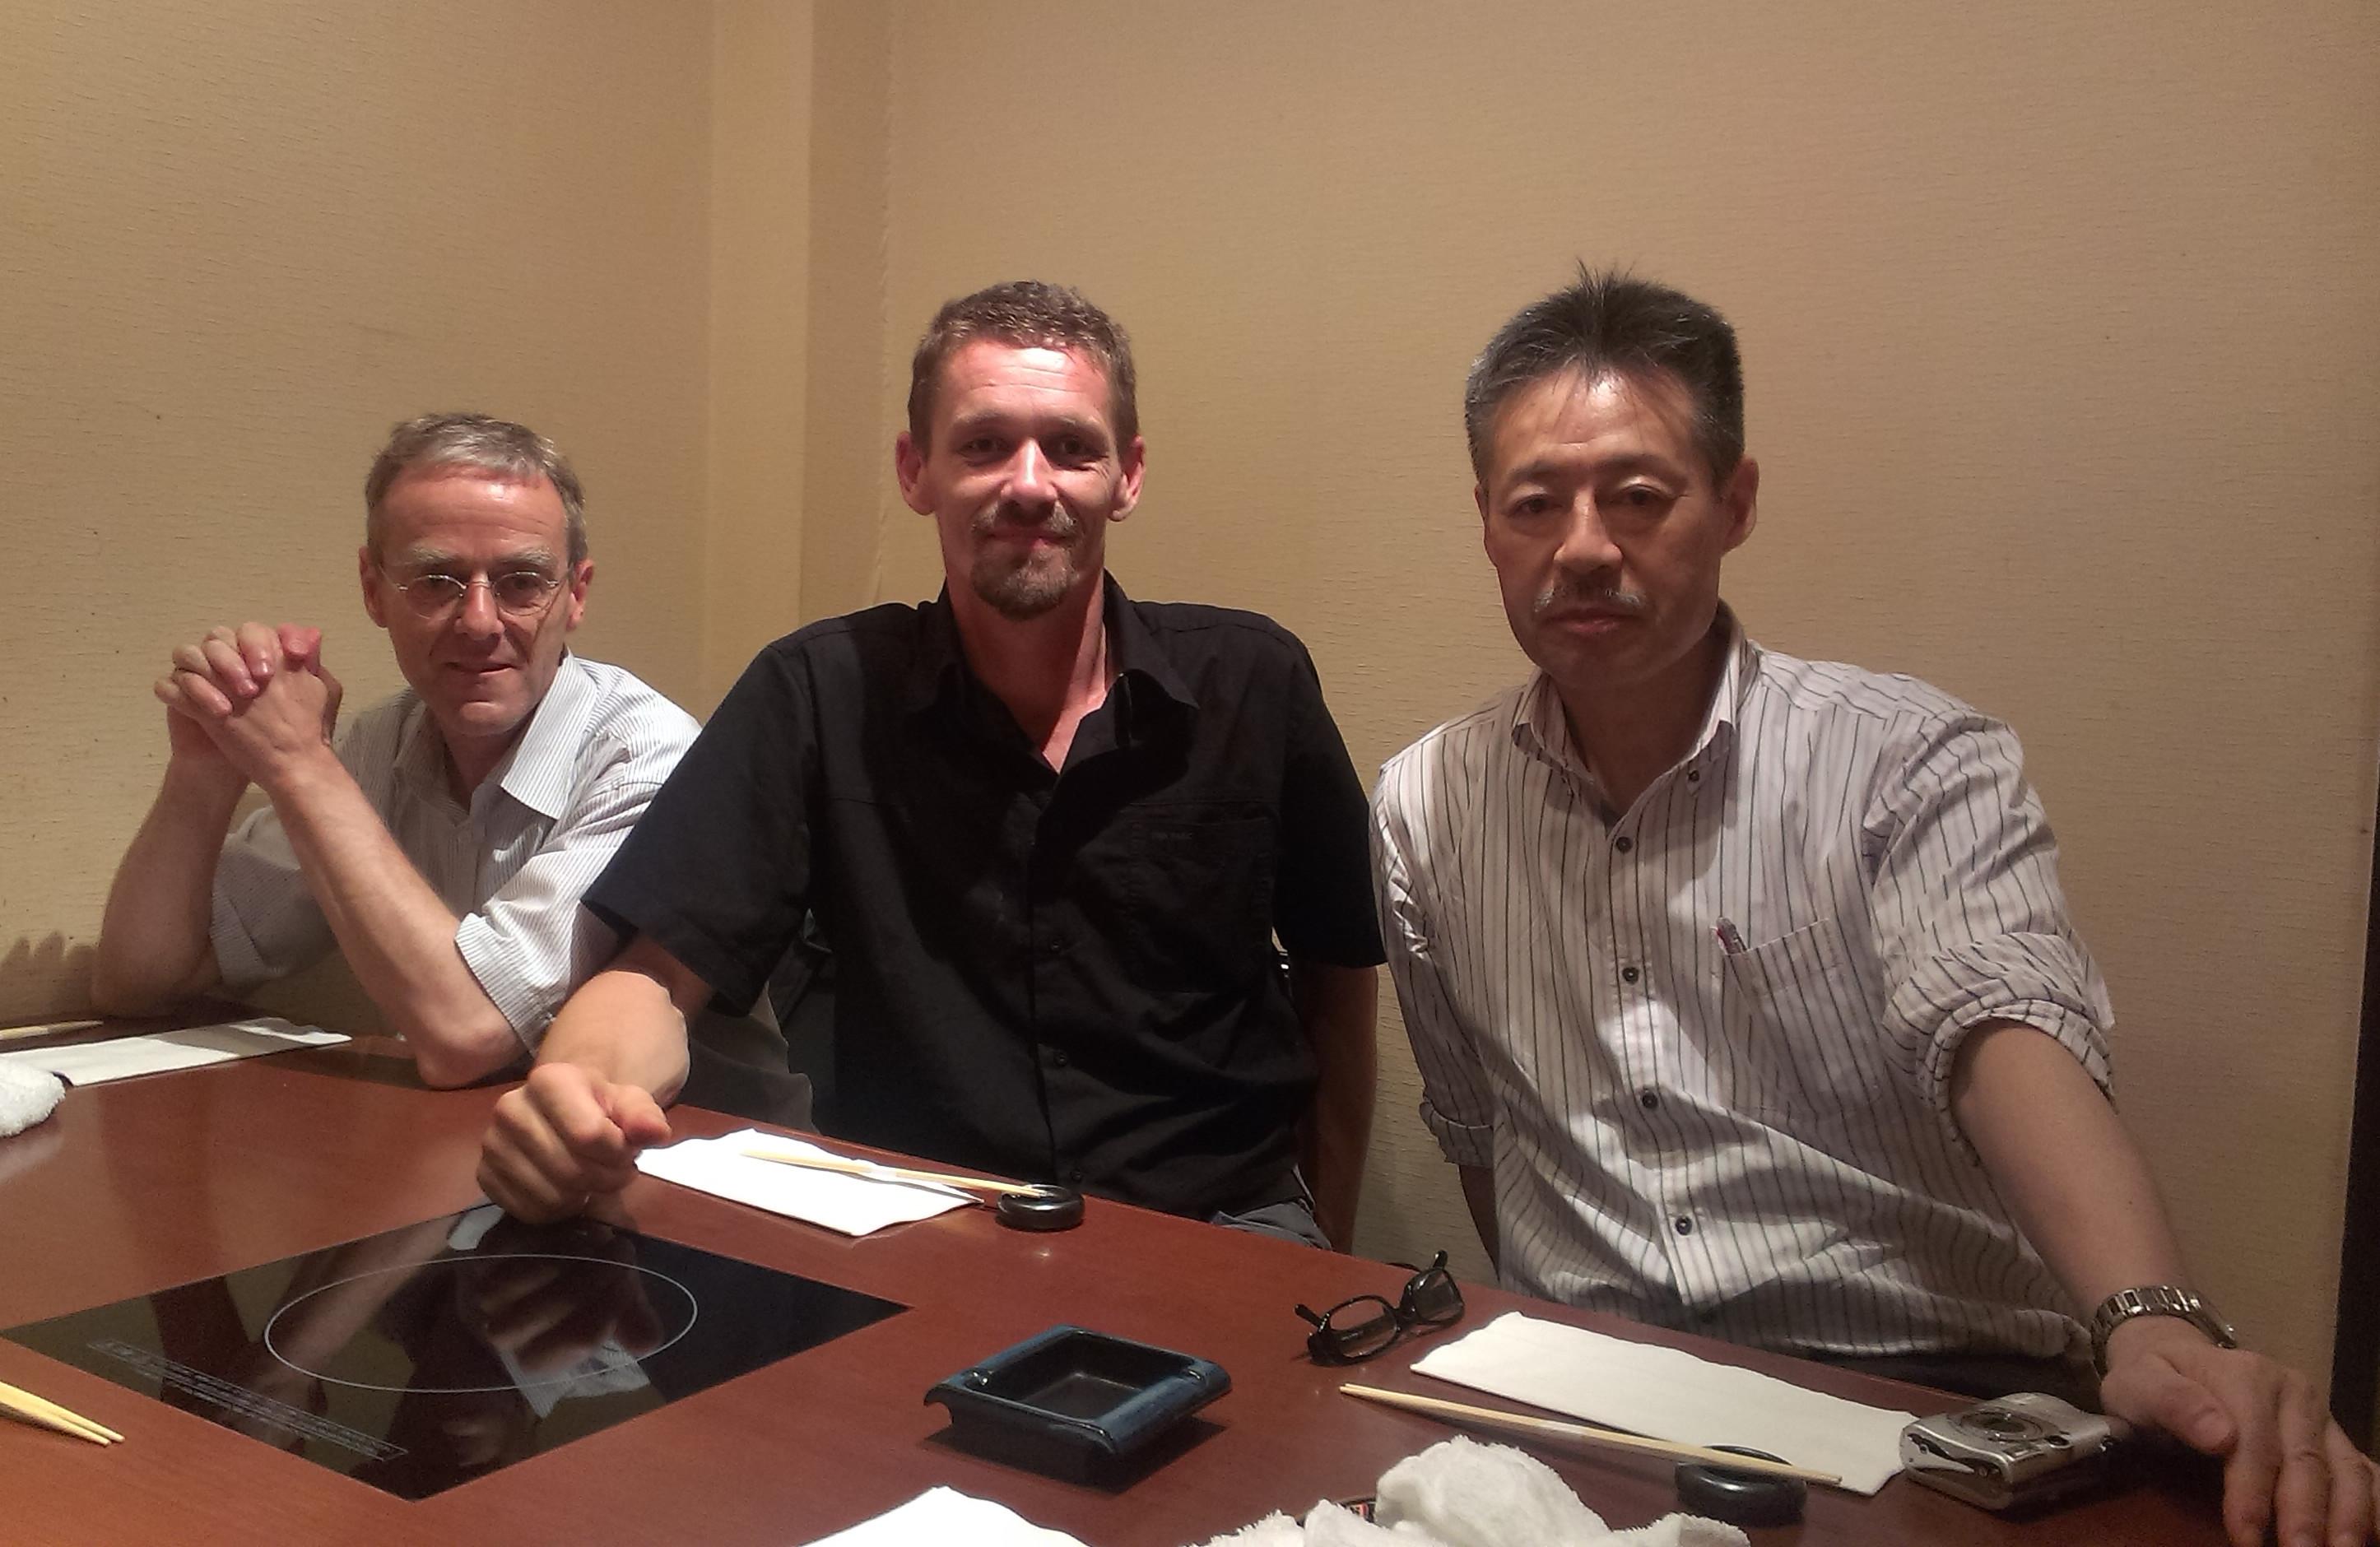 Andreas Nievergelt, Franck Cinato, Teiji Kosukegawa